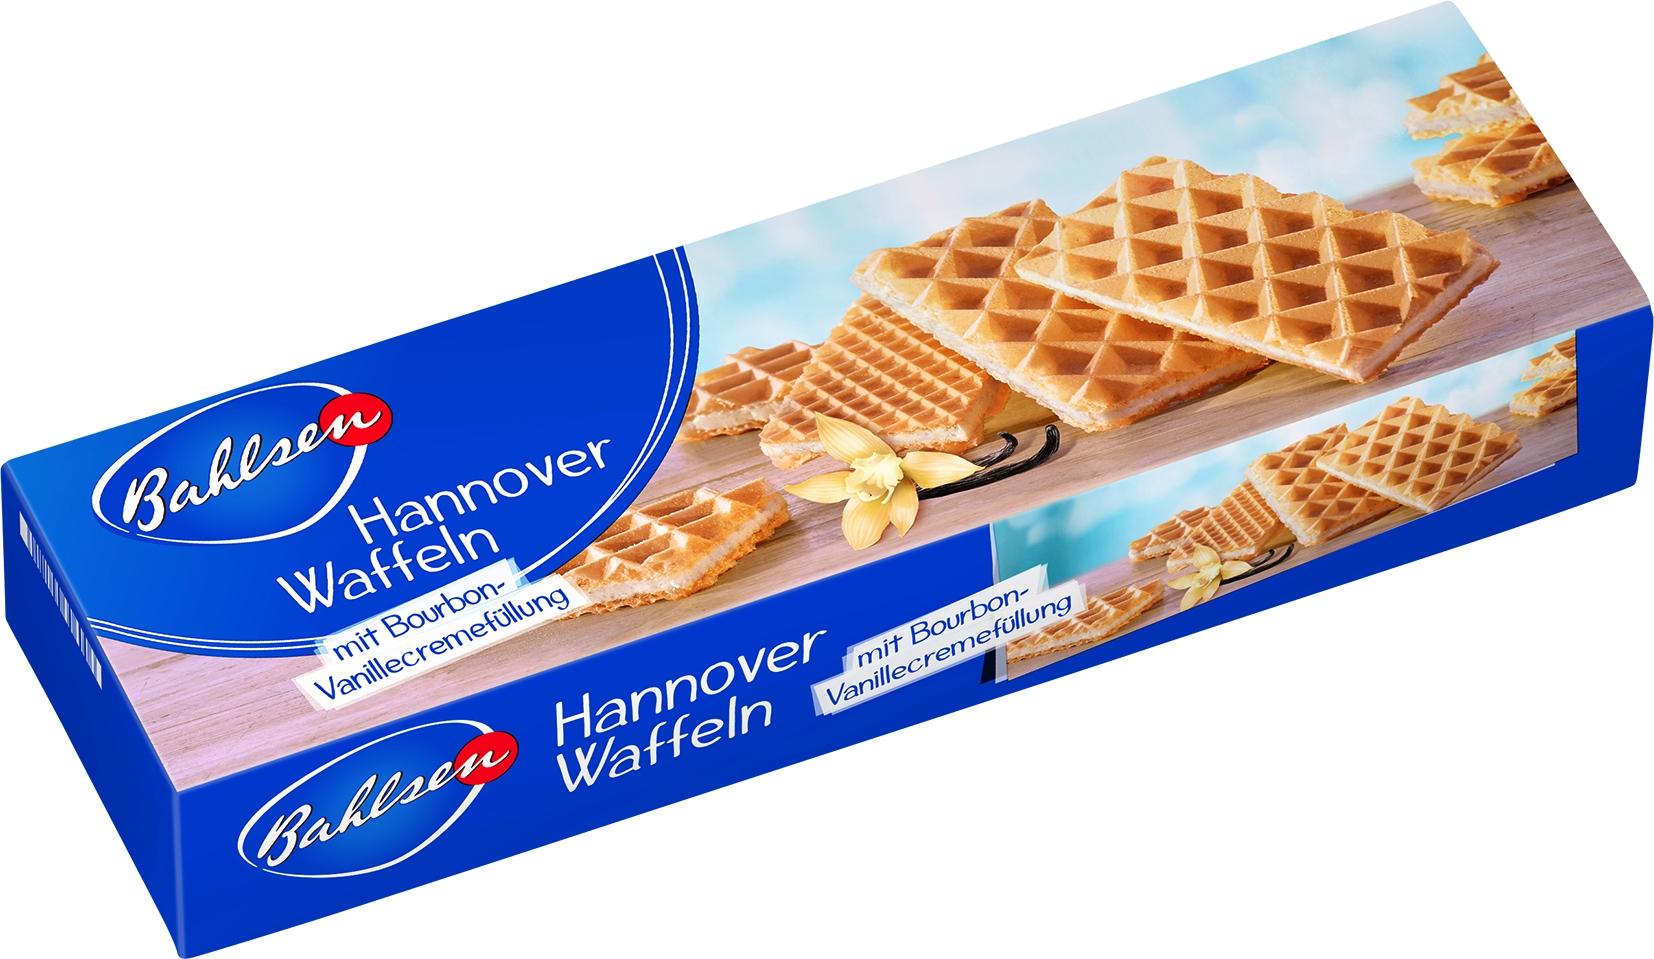 Hannover-Waffeln